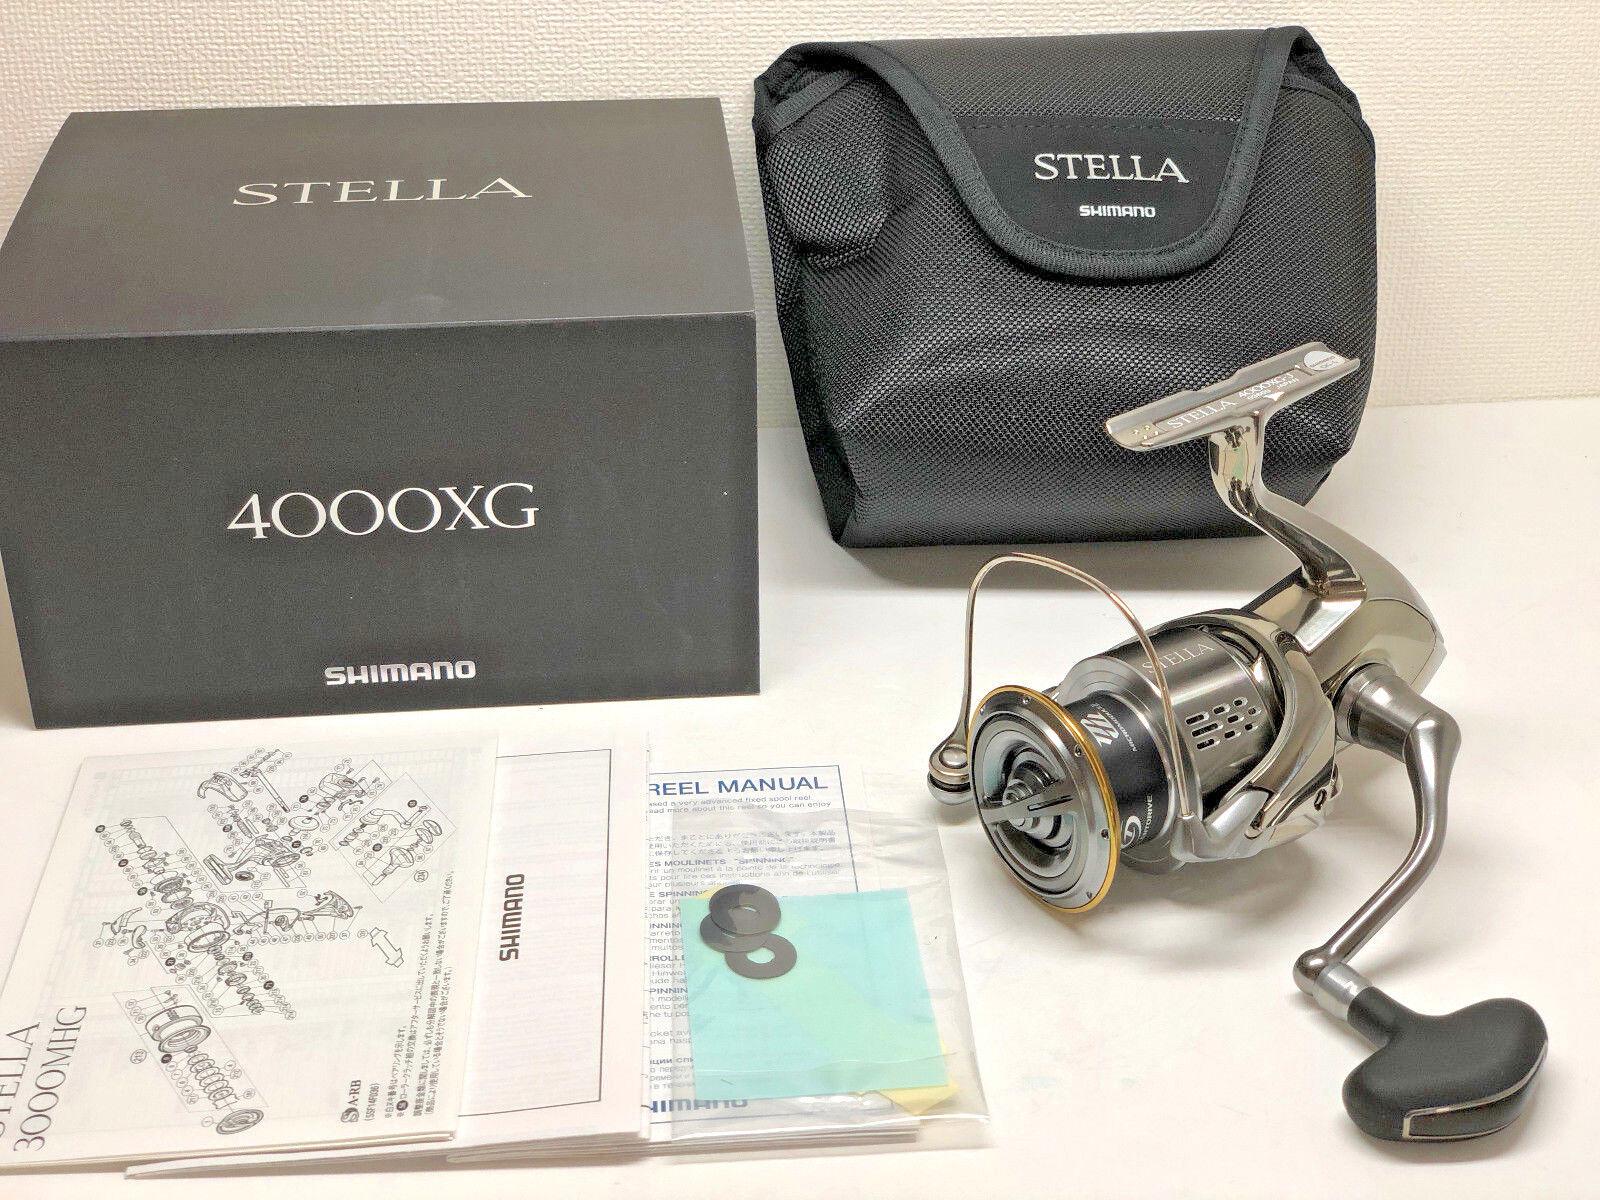 SHIMANO 18 STELLA 4000XG  - Free Shipping from Japan